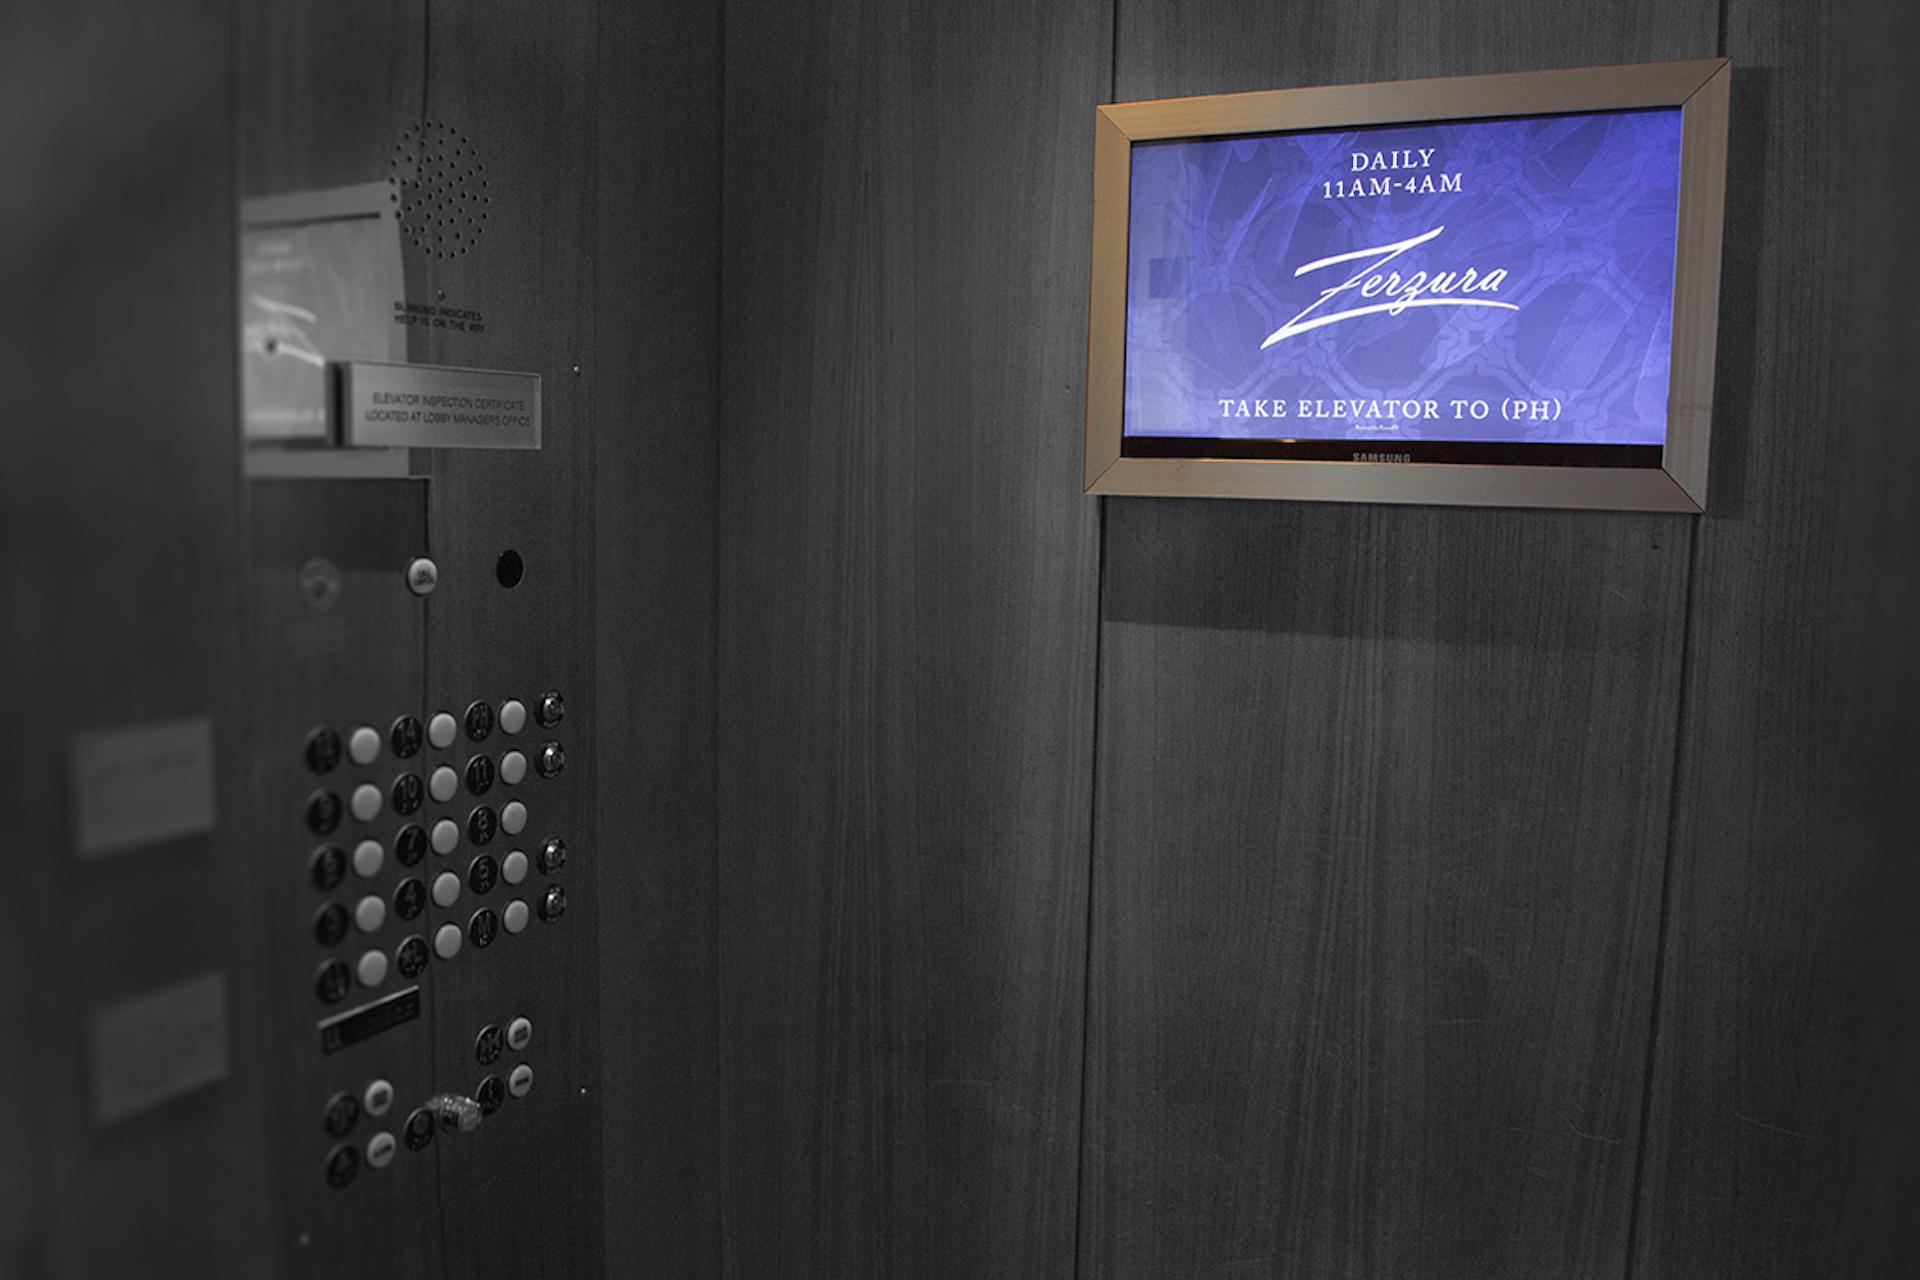 hotel digital signage, elevator digital signage